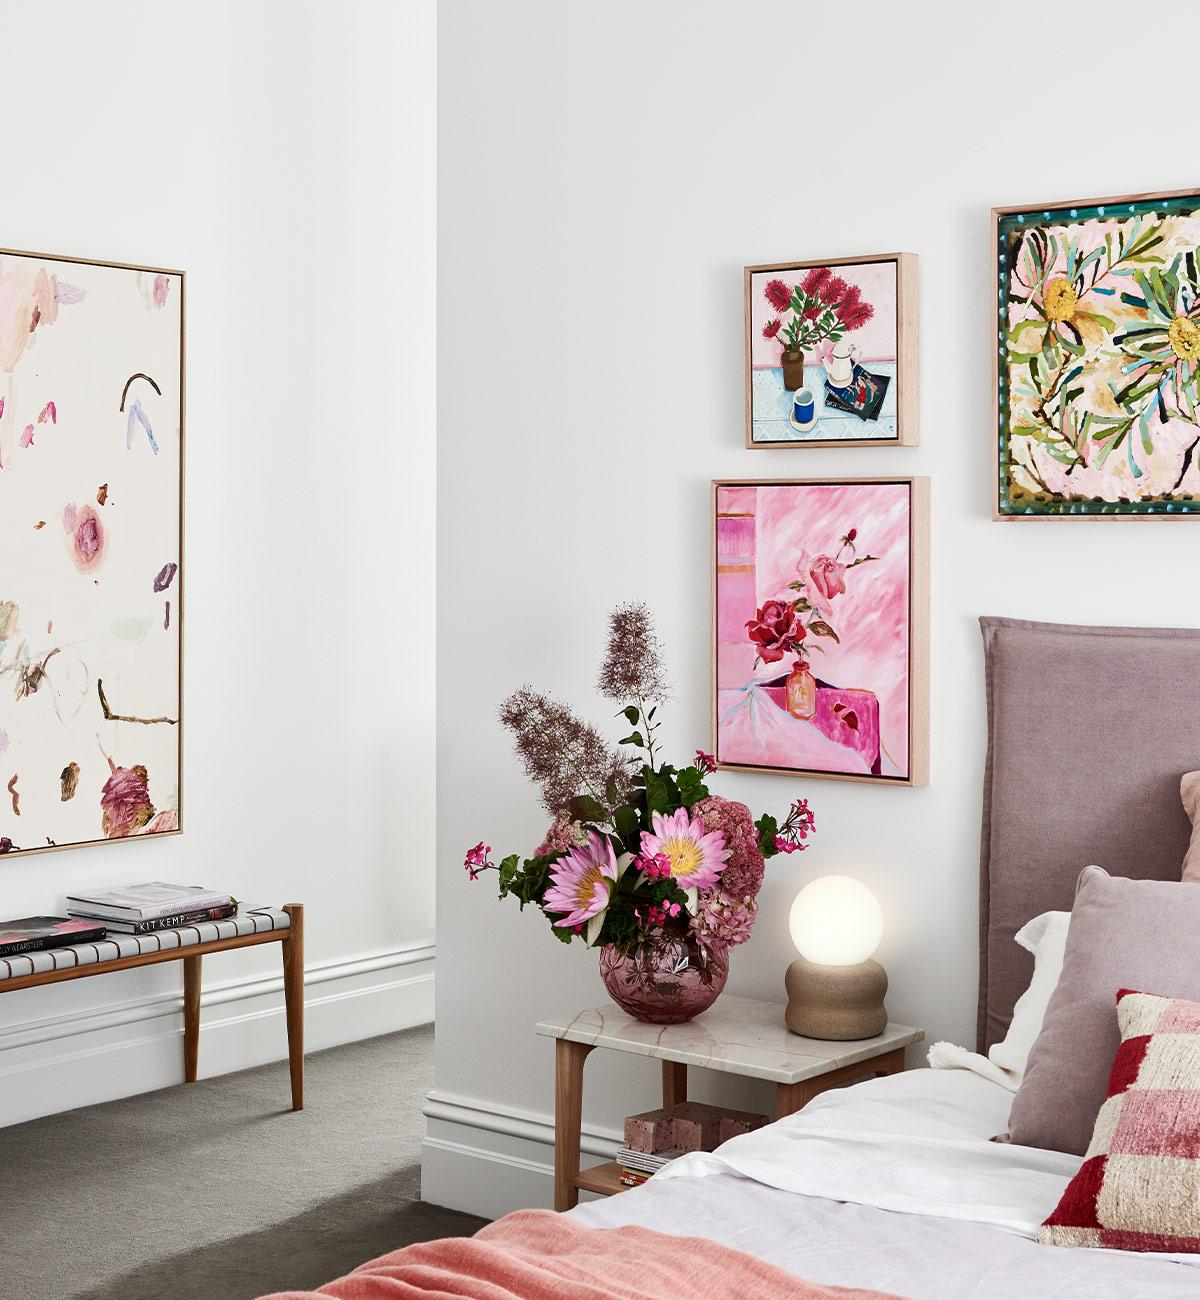 https://storage.googleapis.com/dtk-fenton-fenton/page/Helen-McCullagh-Valentines-Roses-Situ_1585033134227.jpg